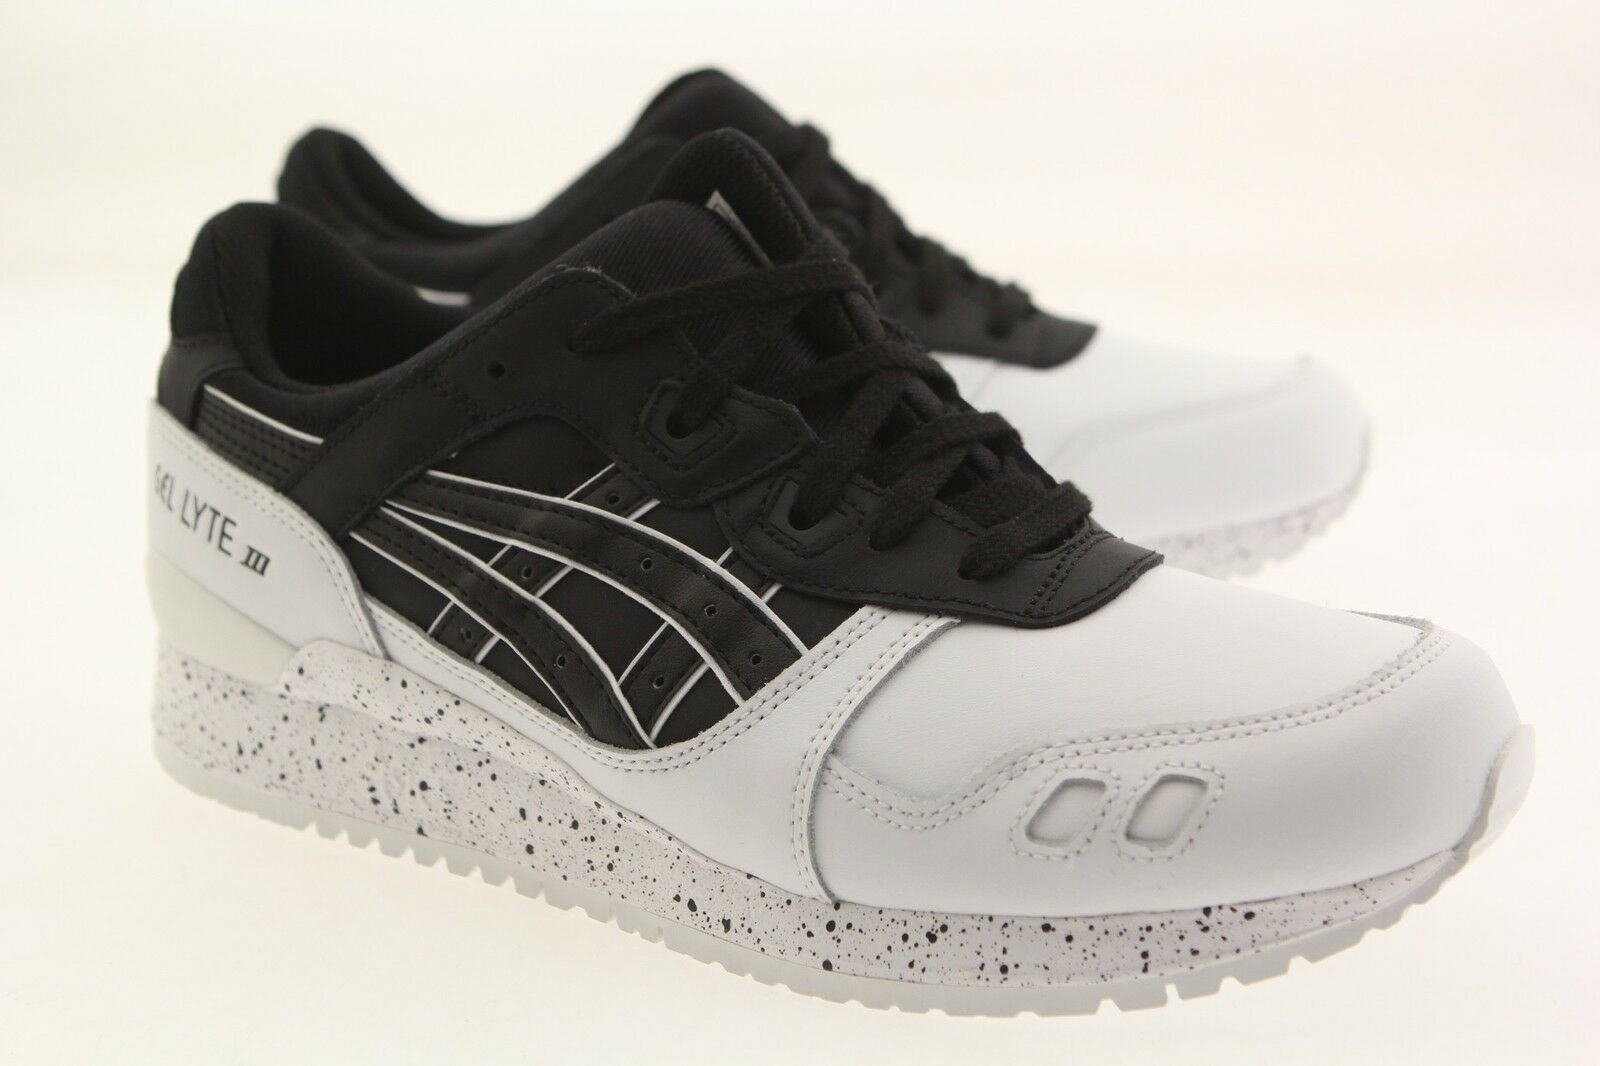 Asics Tiger hommes Gel-Lyte III noir noir Blanc H6T1L-9090